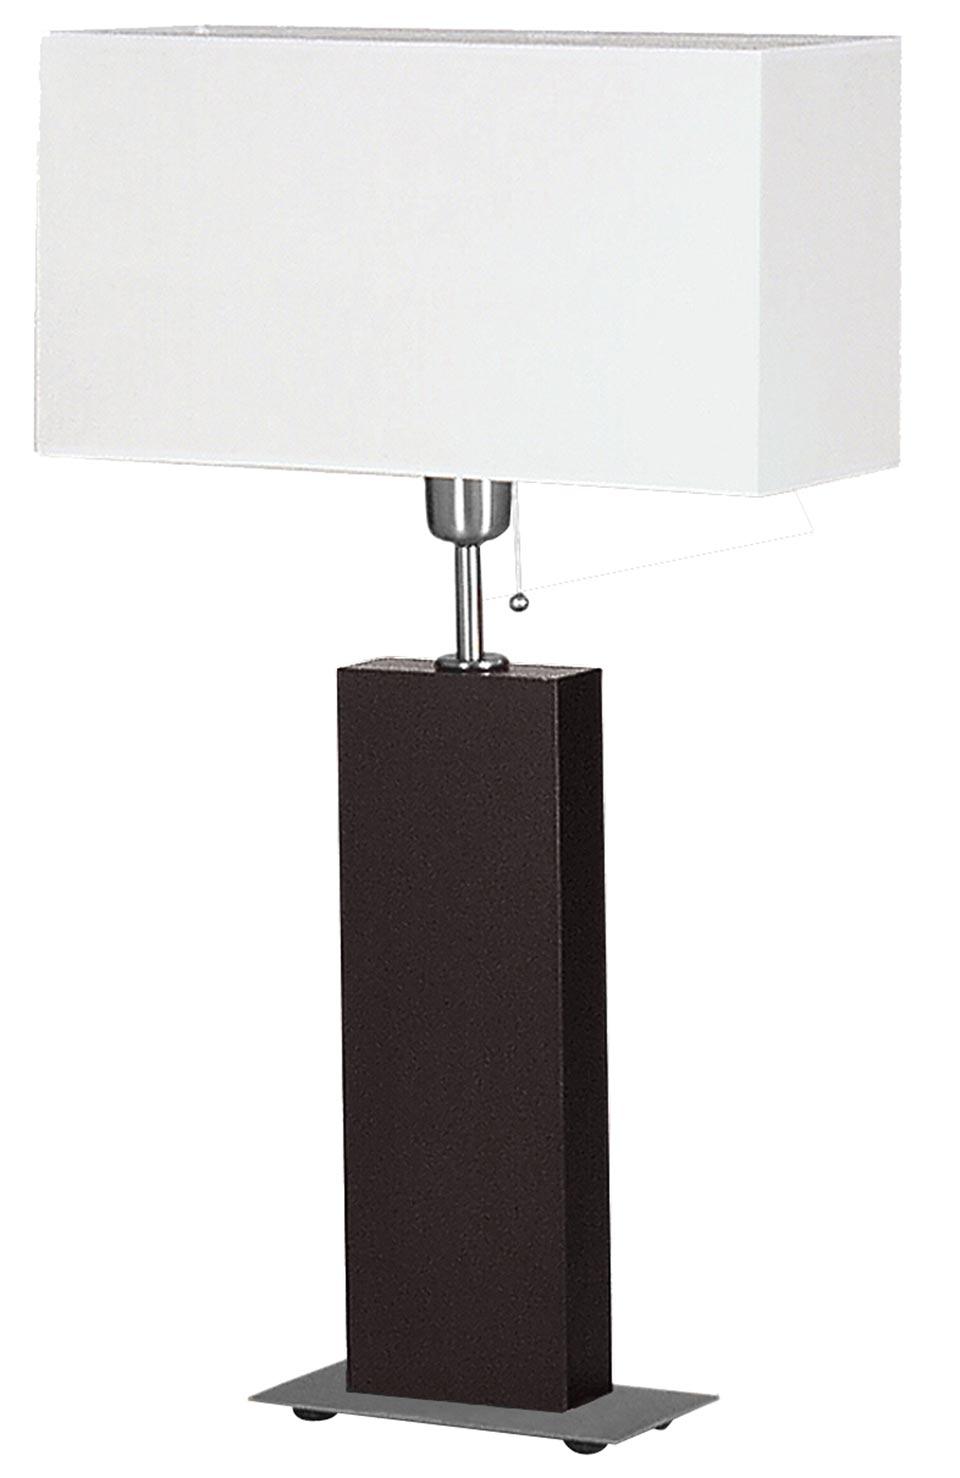 Mara Noir lampe . Le Dauphin.